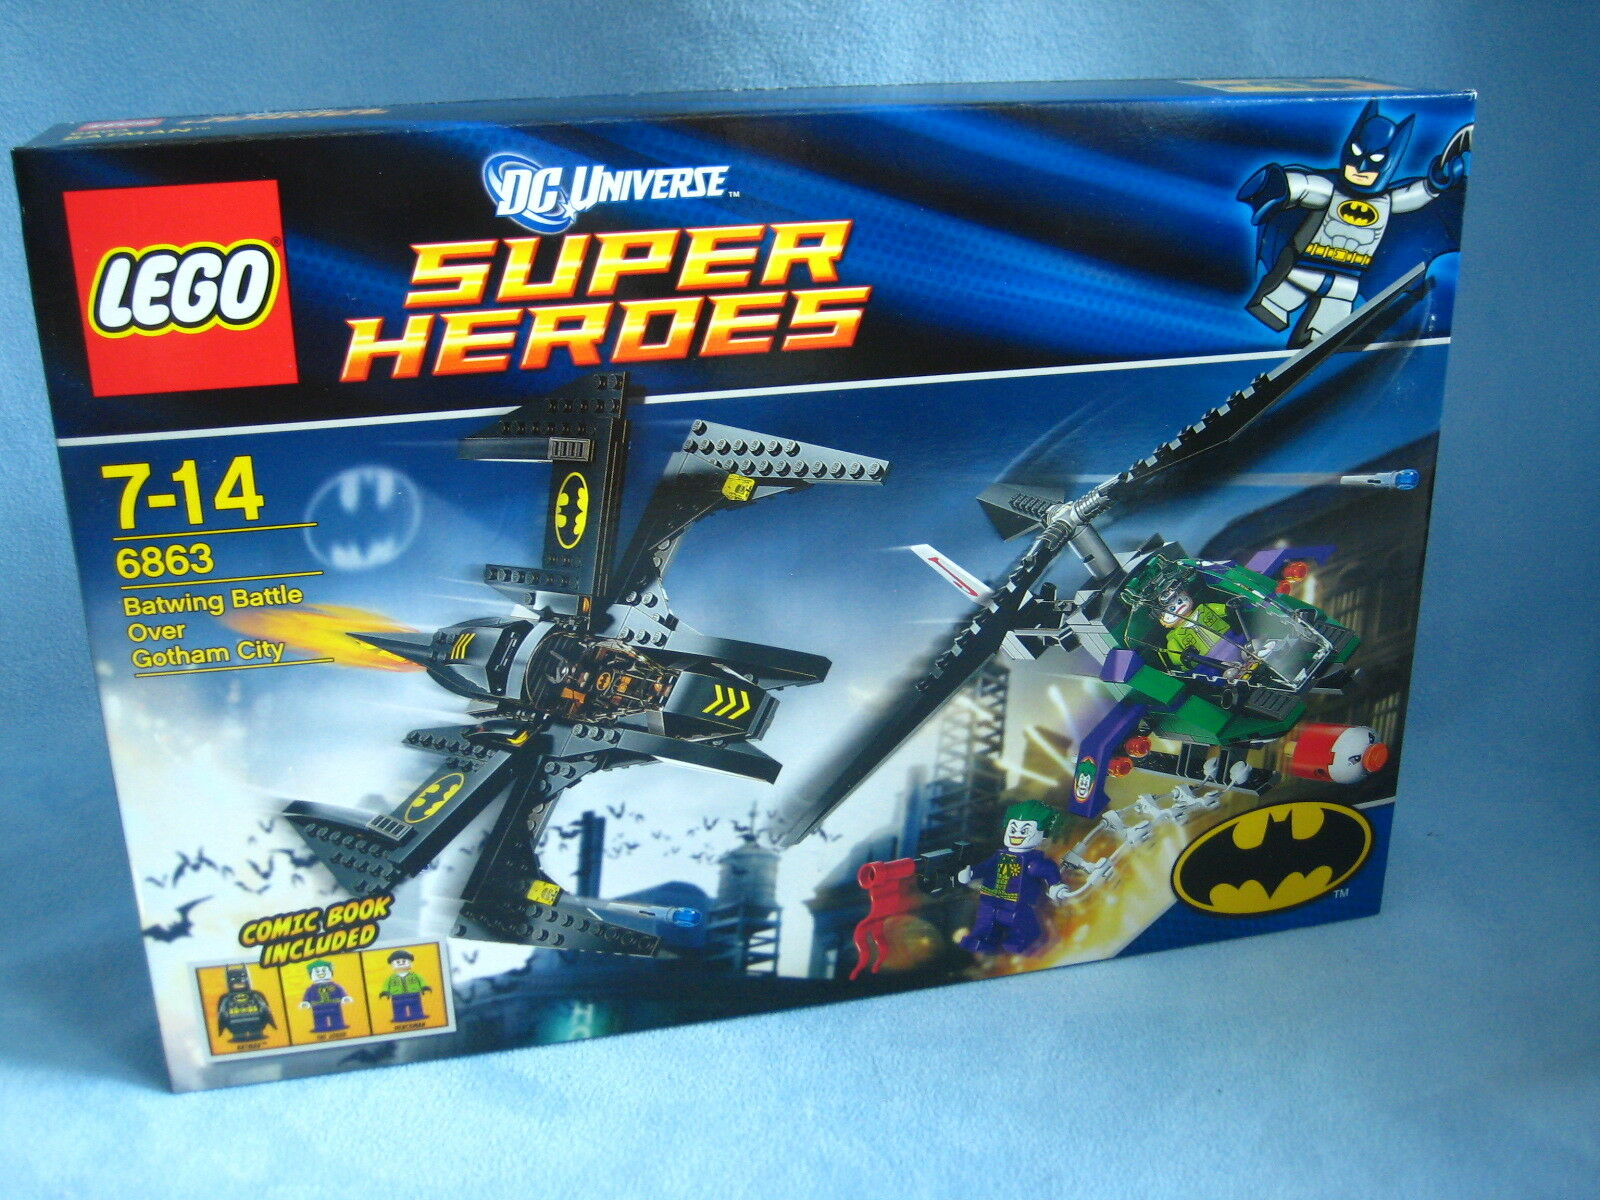 Lego DC Super Heroes Batman 6863  Batwing Battle over Gotham City  Neu + Ovp